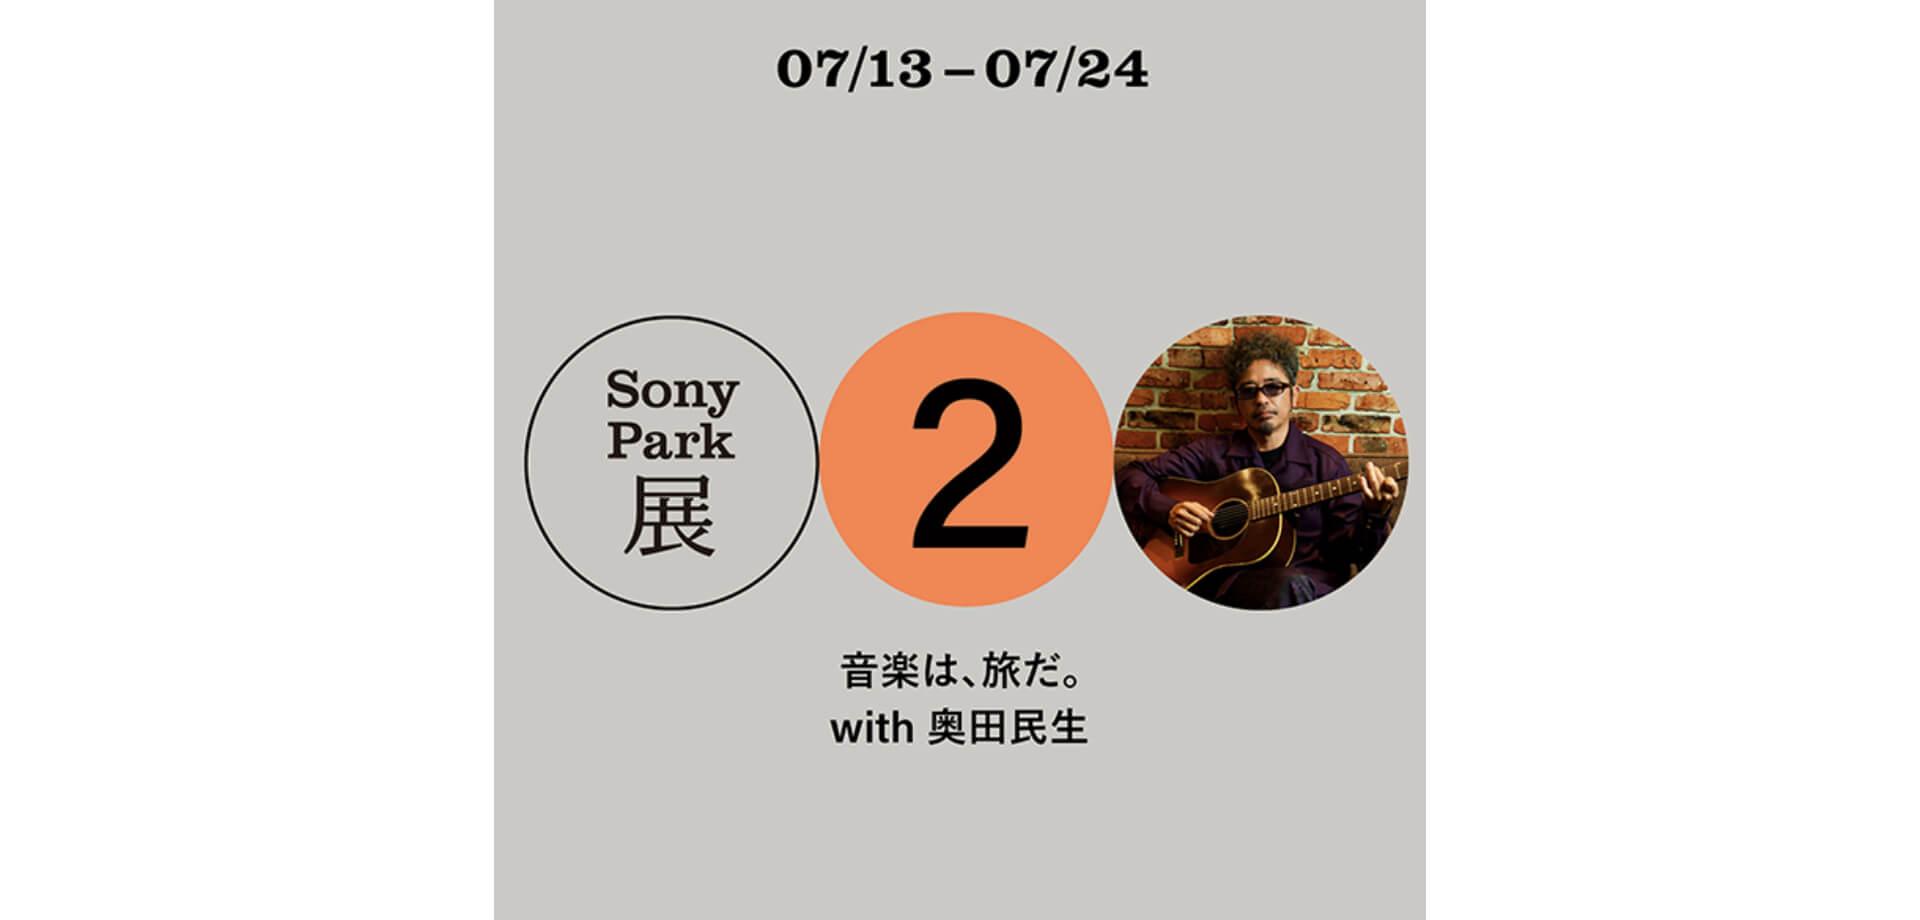 Sony Park展「音楽は旅だ」